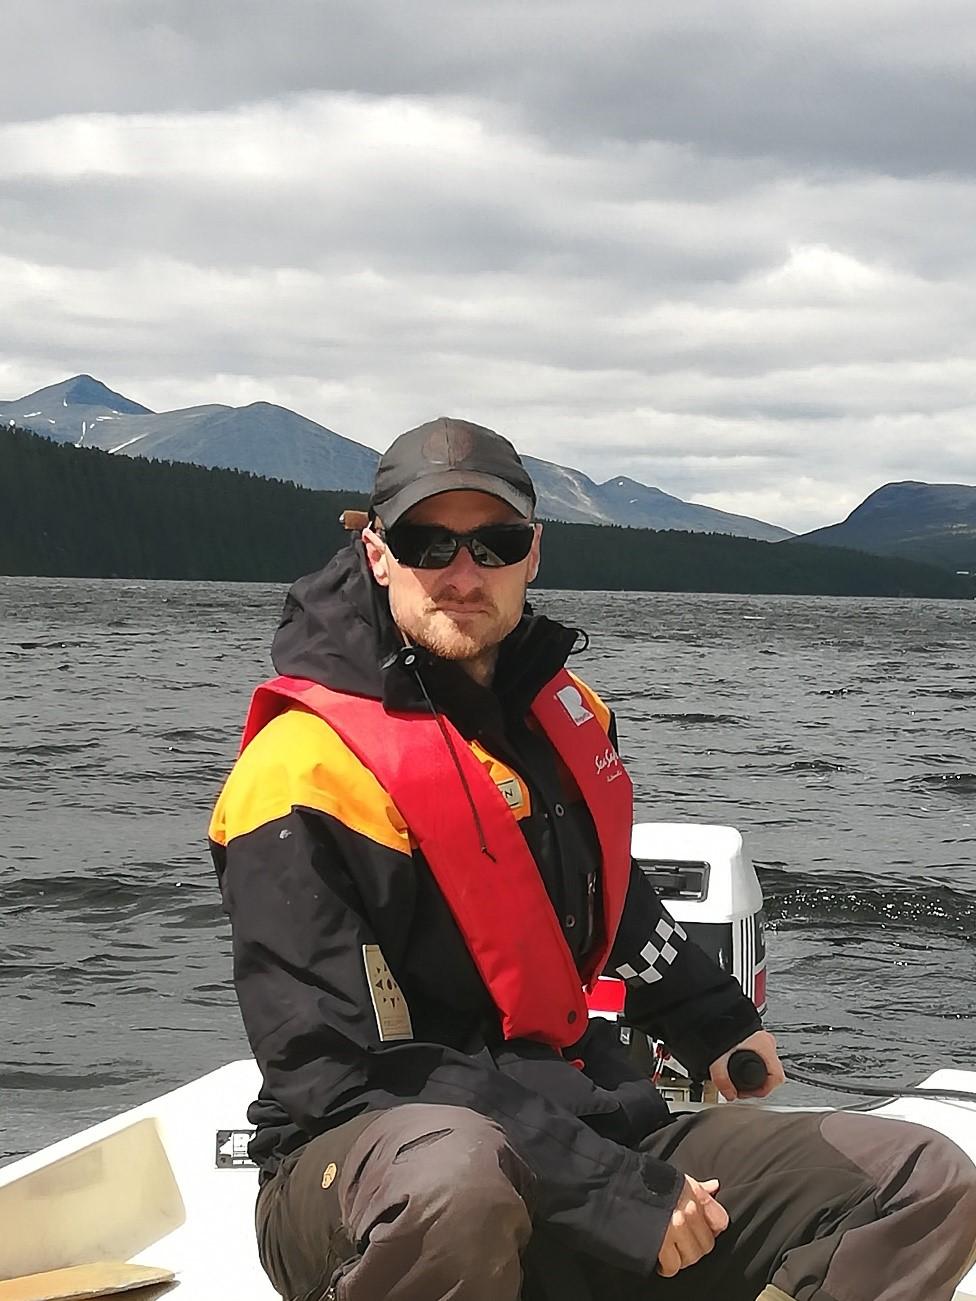 Her er daglig leder Hans Petter Ruud ute på Atnsjøen.